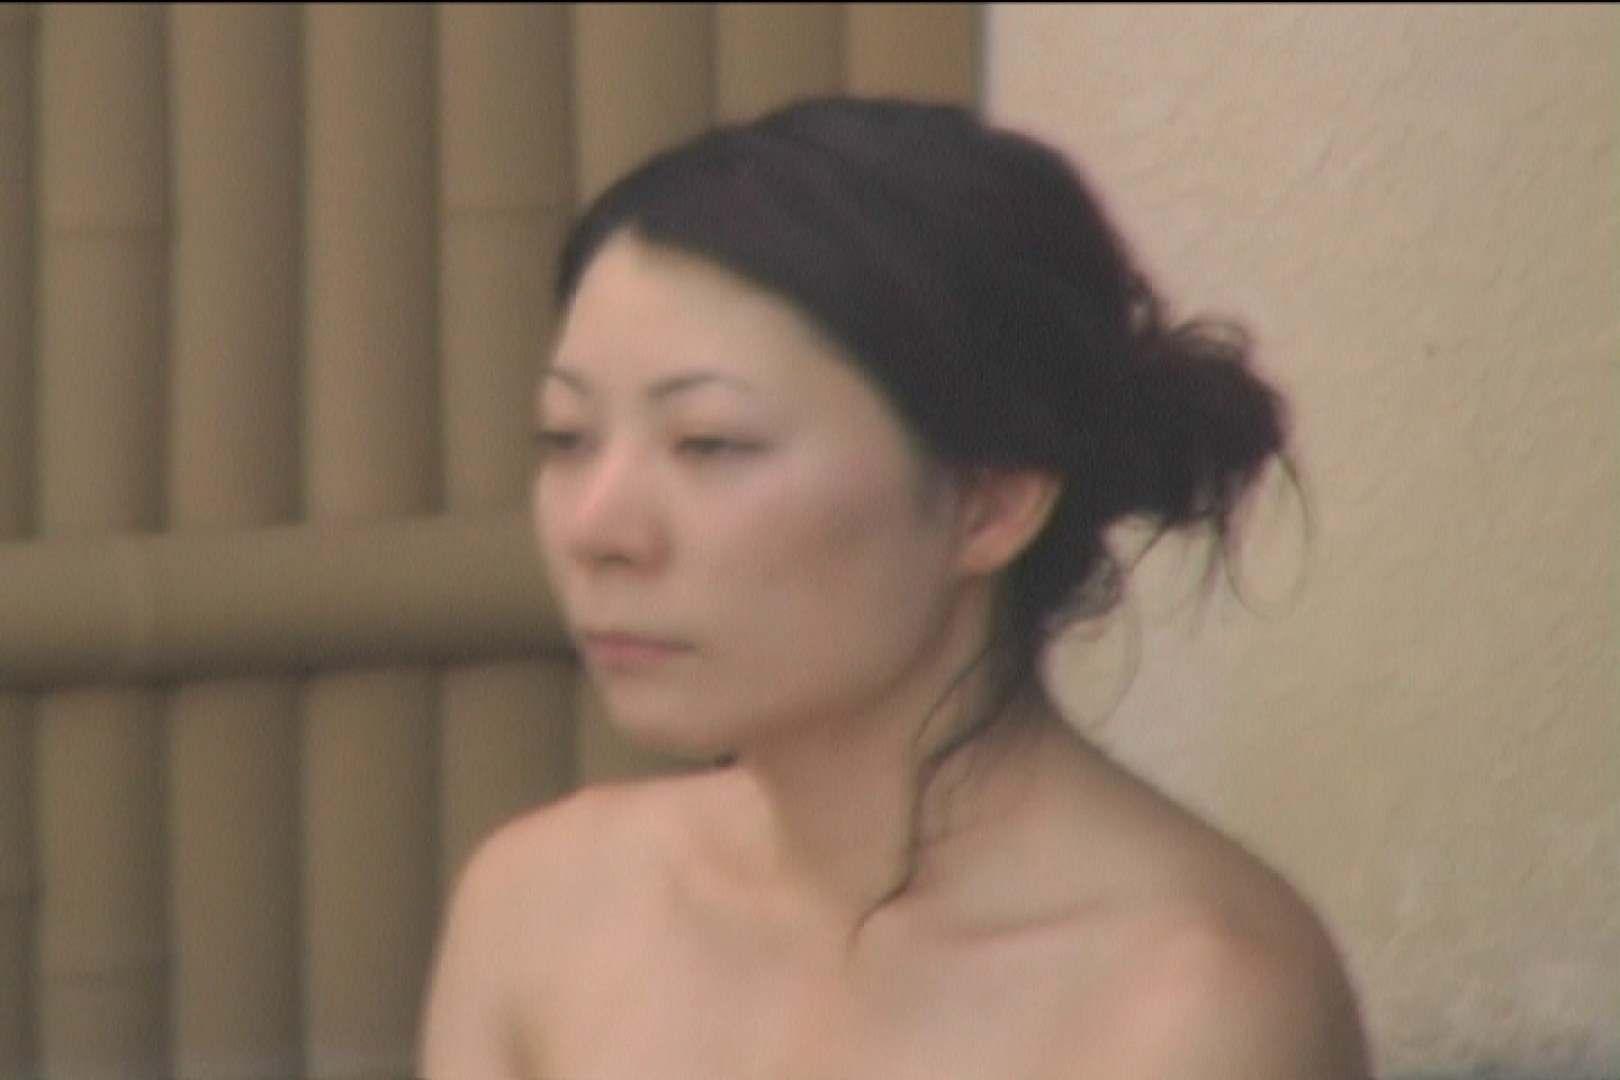 Aquaな露天風呂Vol.533 盗撮  68連発 45